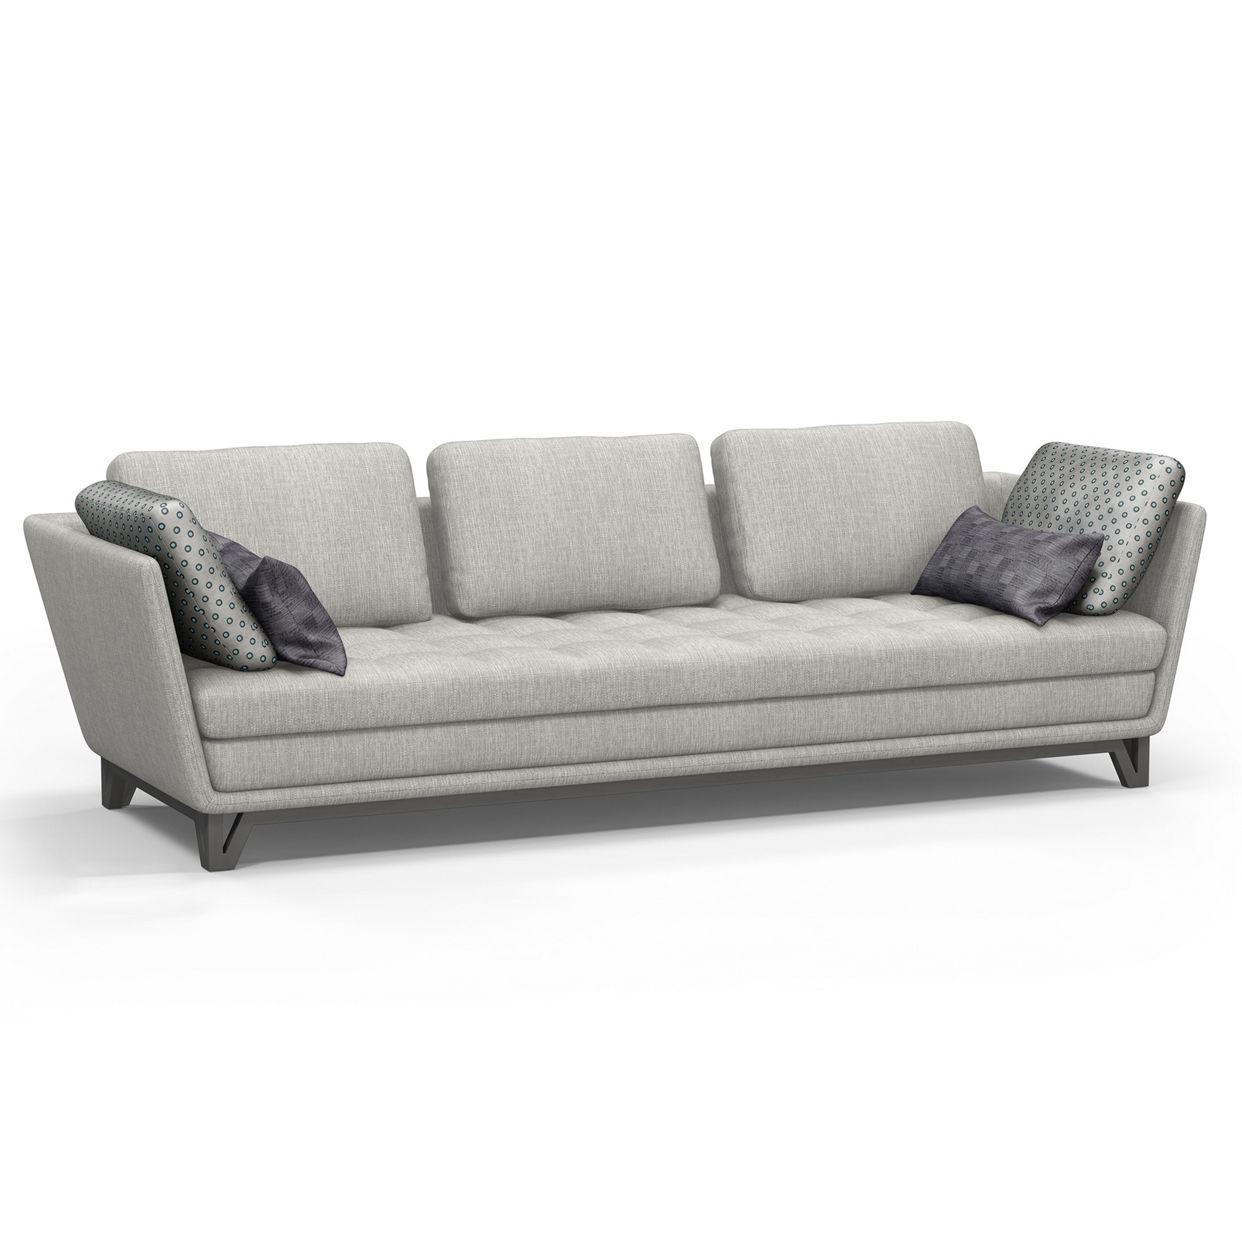 Littoral 3 4 Seat Sofa Sofas Roche Bobois Sofa Sofa